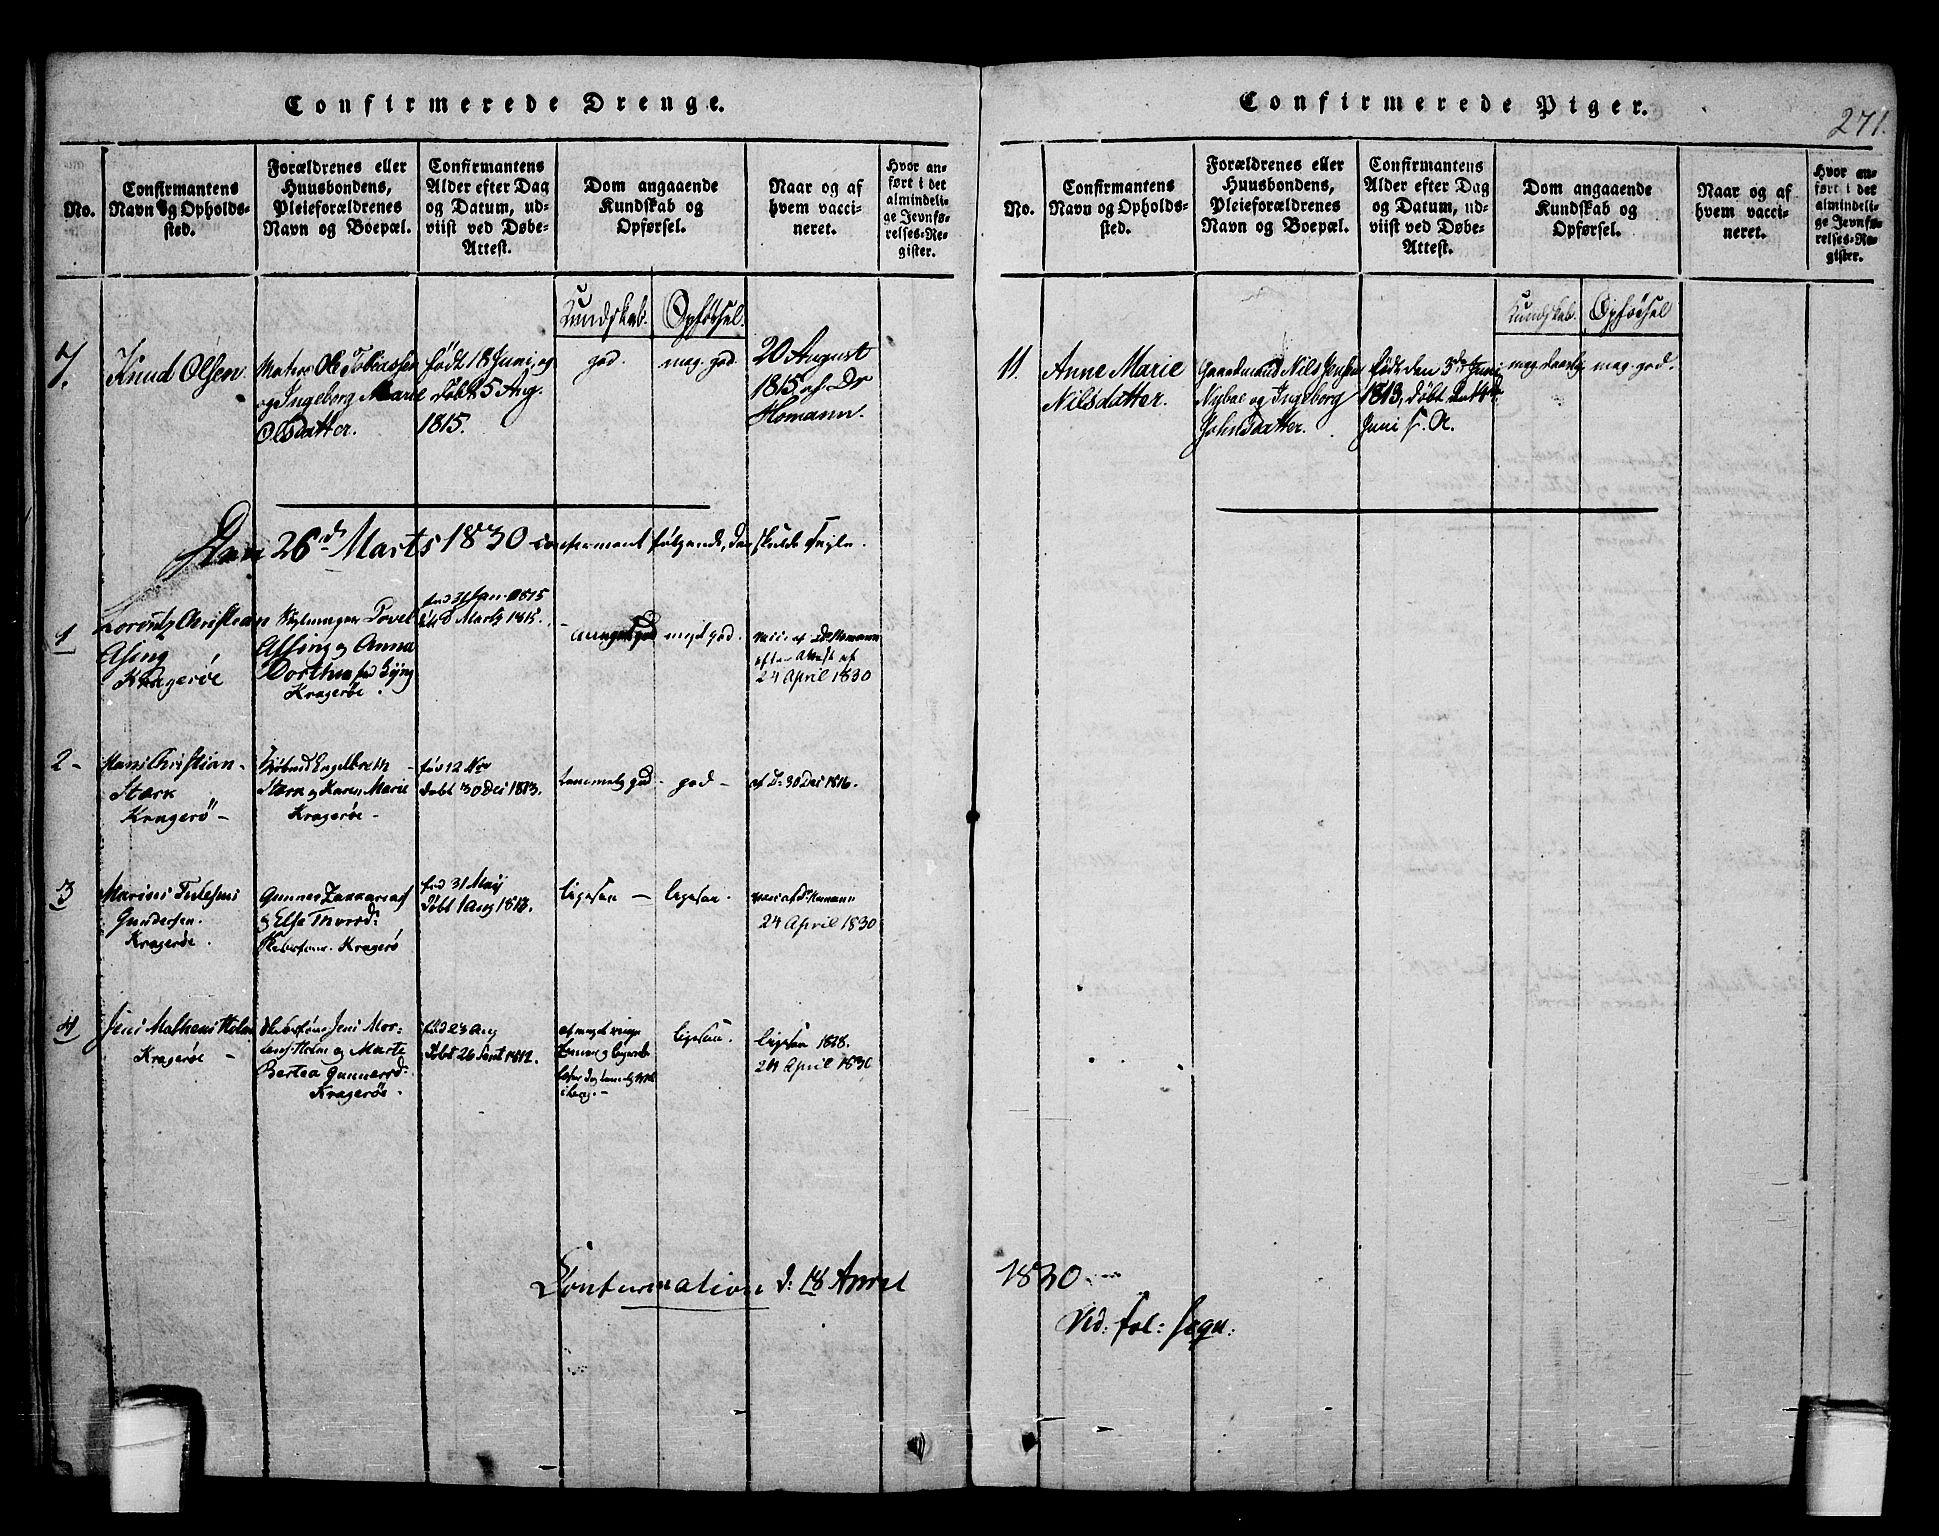 SAKO, Kragerø kirkebøker, F/Fa/L0004: Ministerialbok nr. 4, 1814-1831, s. 271